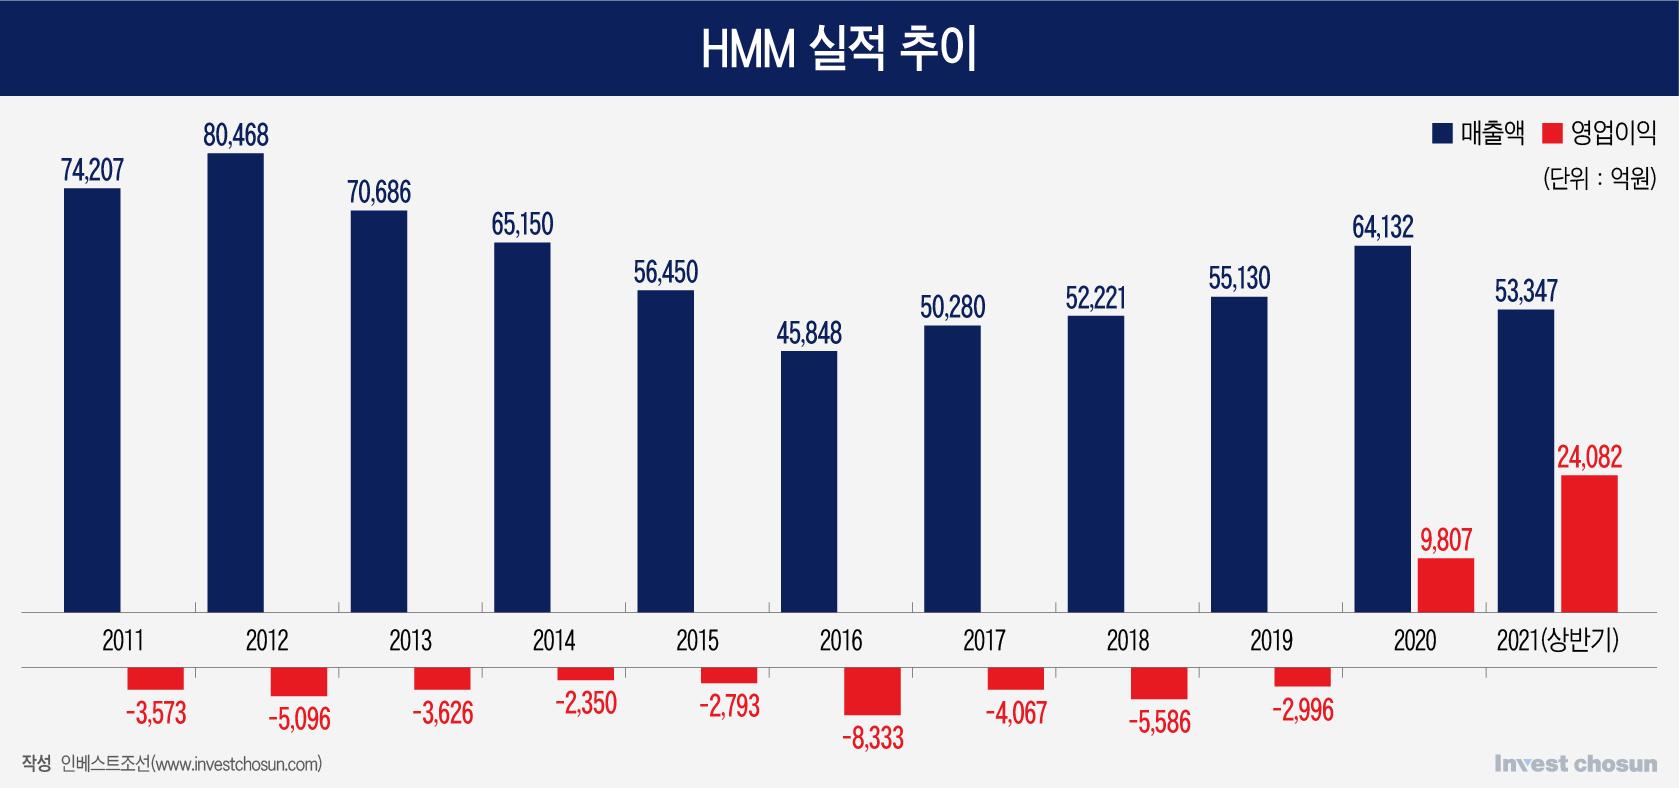 HMM, 호황에도 경영 불확실성 여전…해진공 자문 용역도 진행